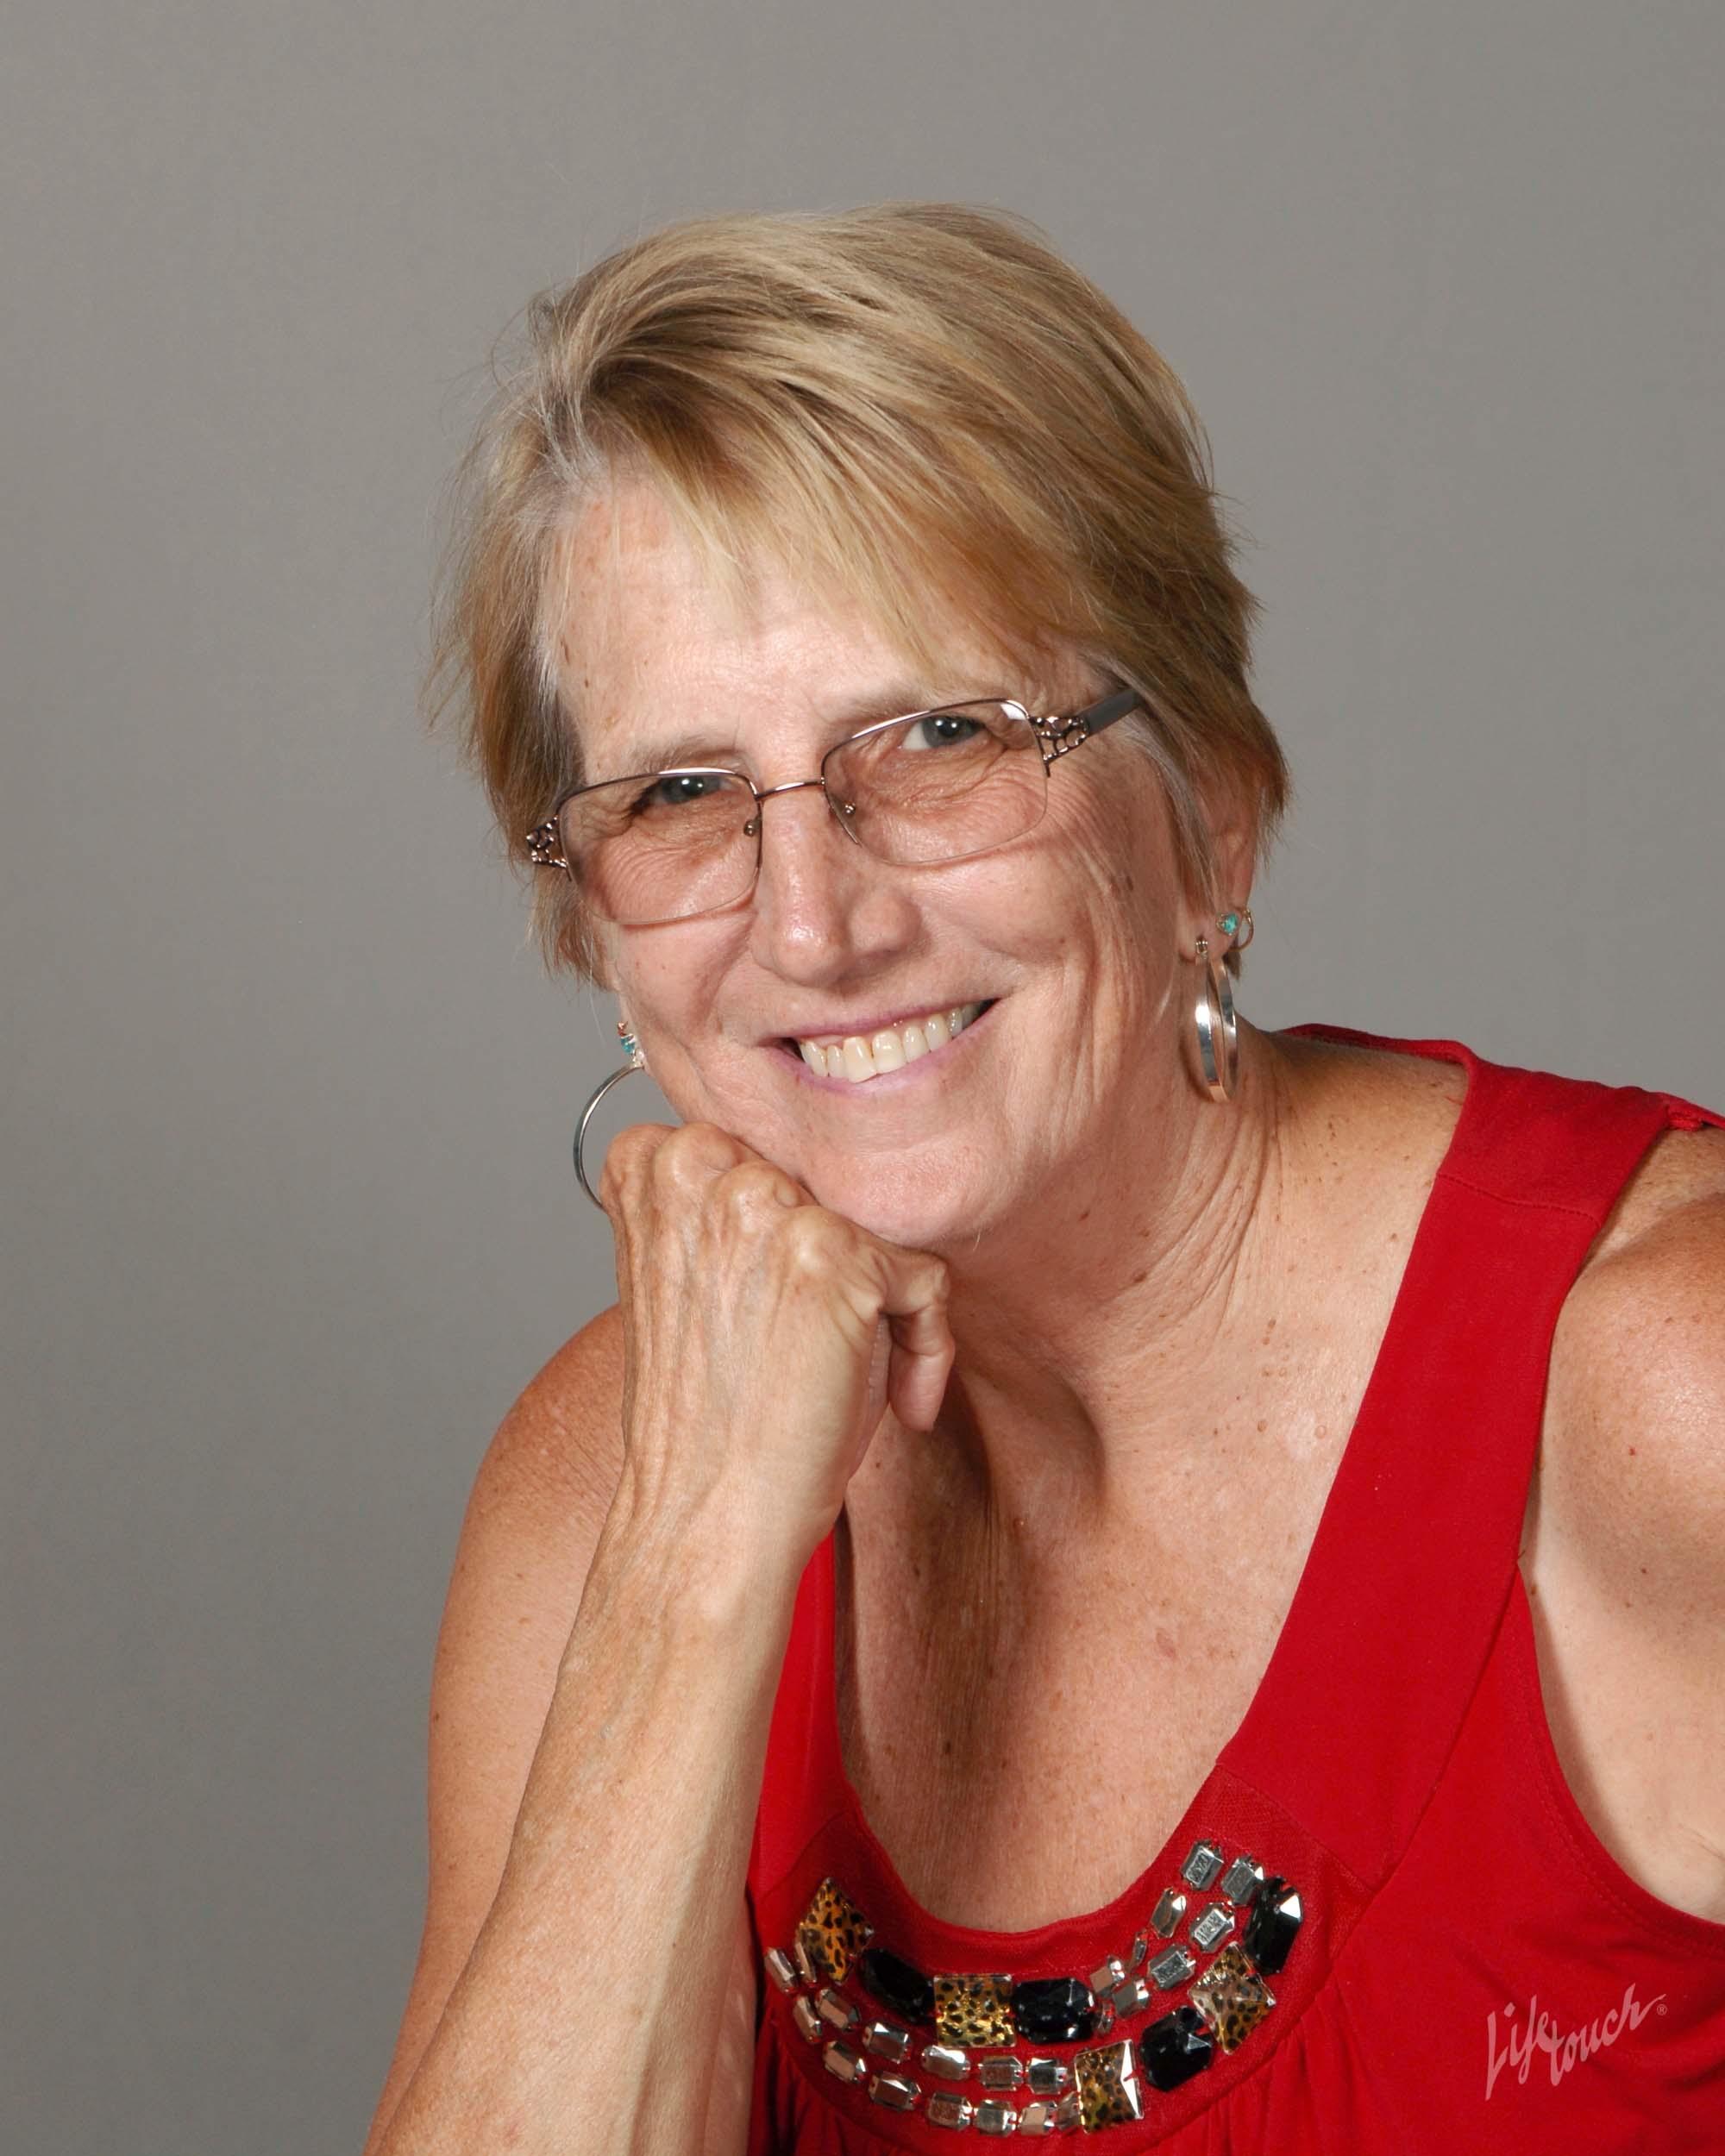 A Carol McClain